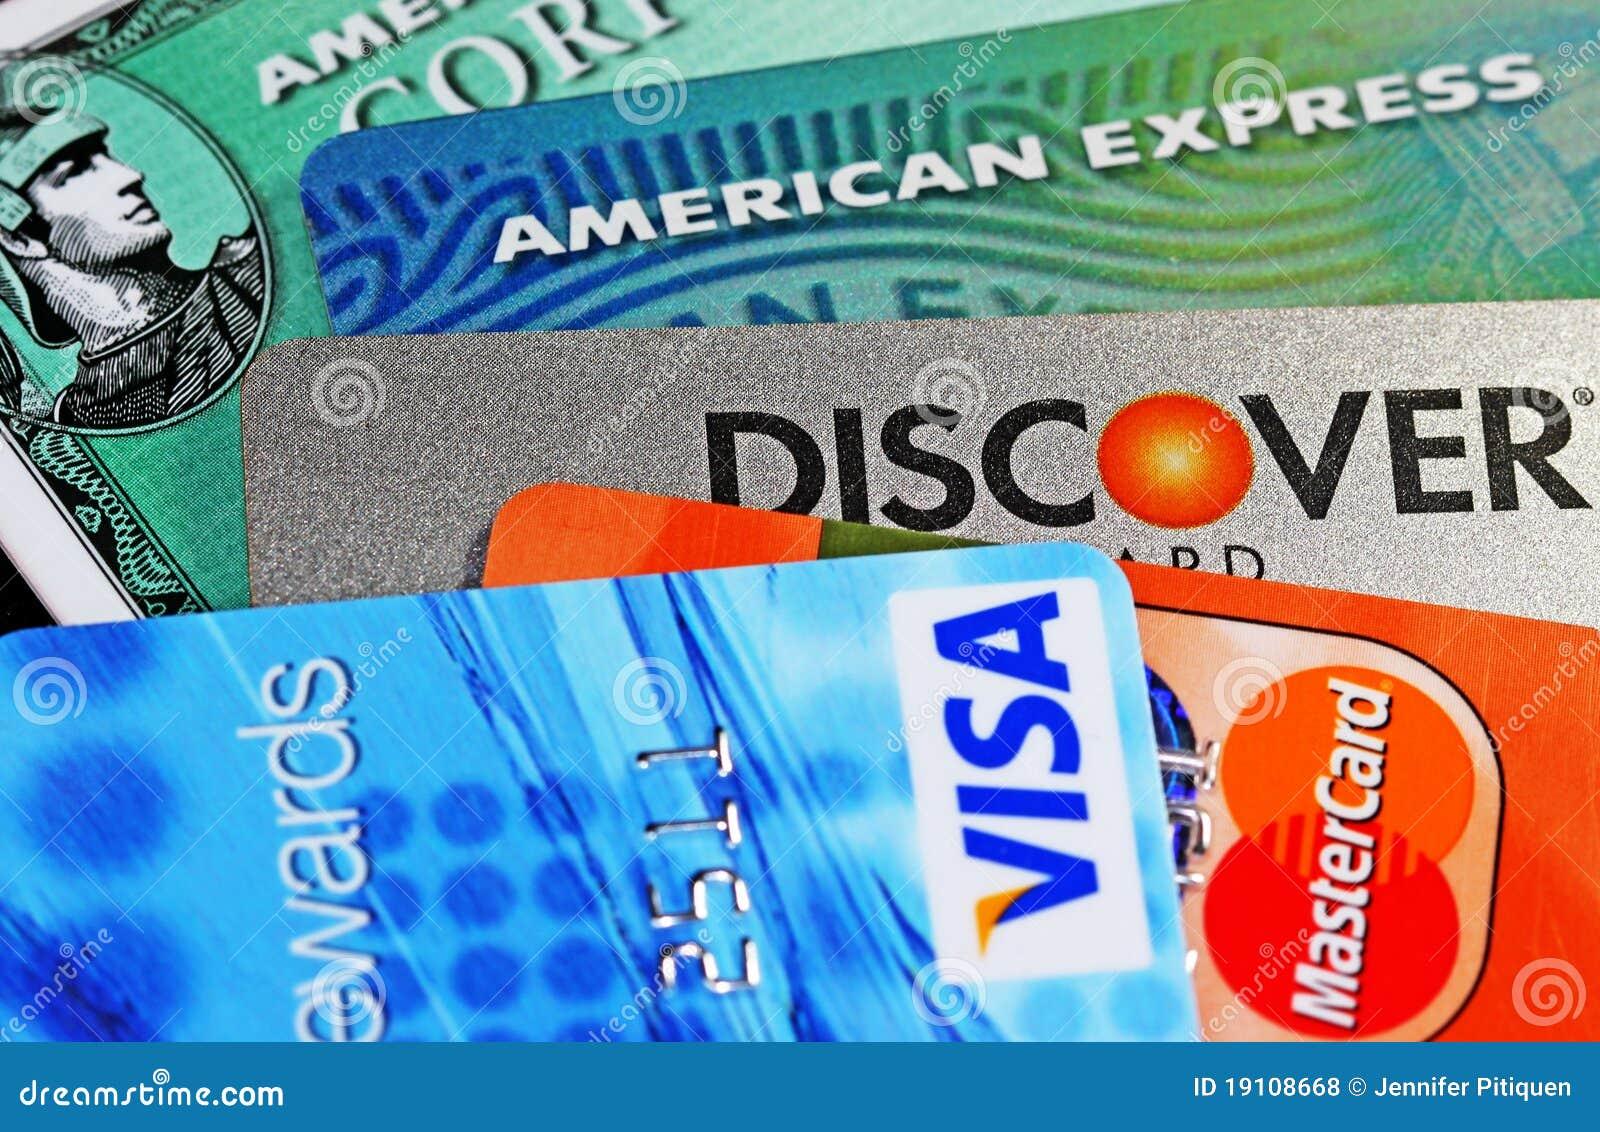 American express business plan primer